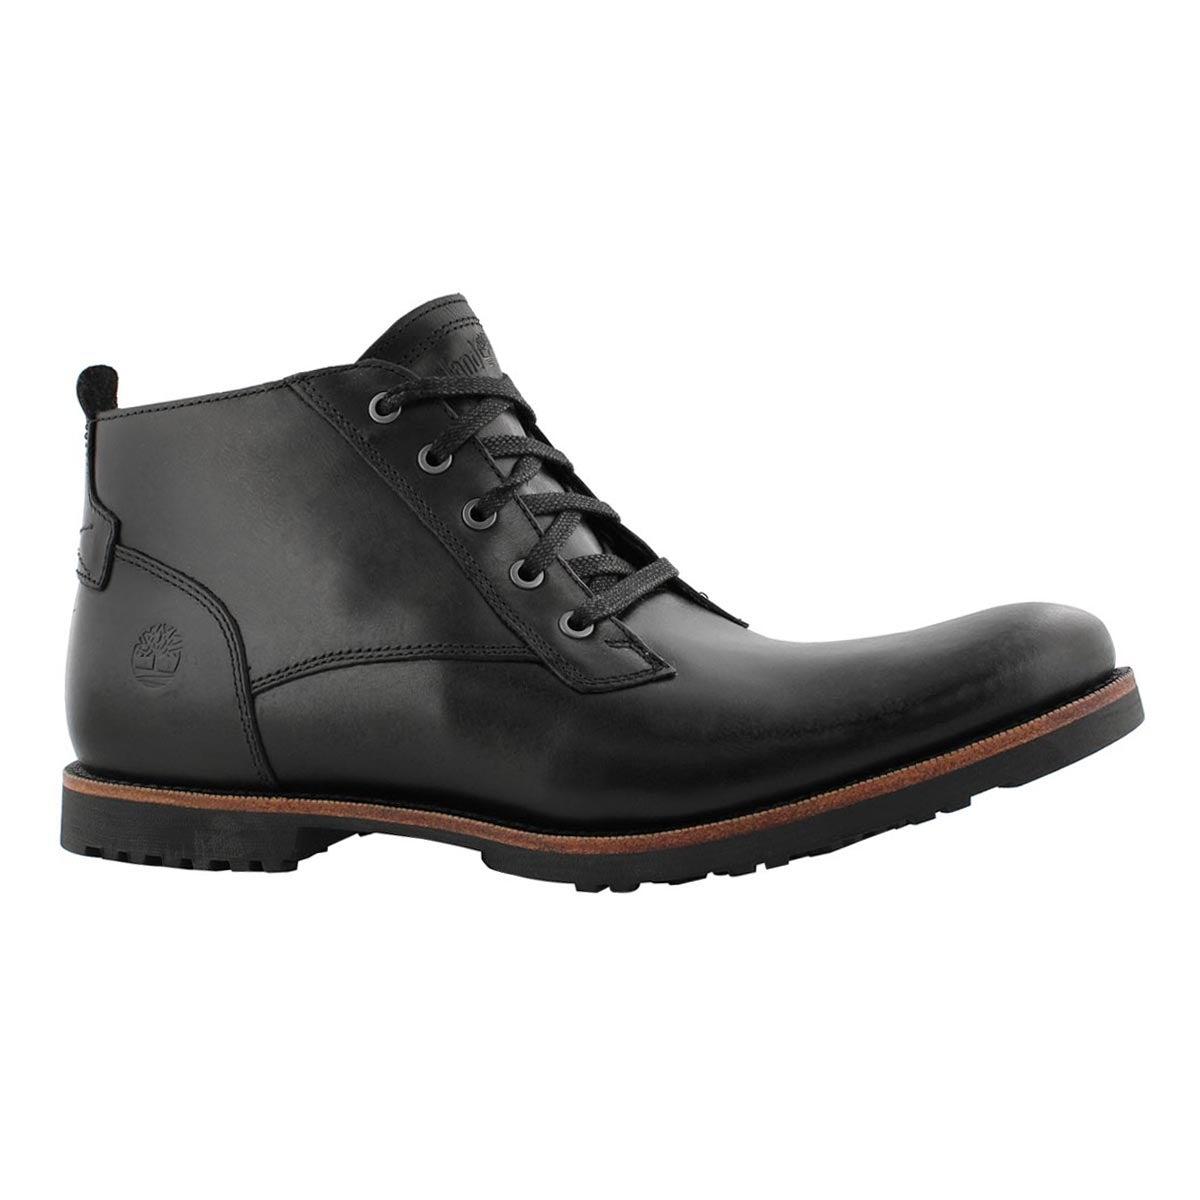 Mns Kendrick black chukka boot